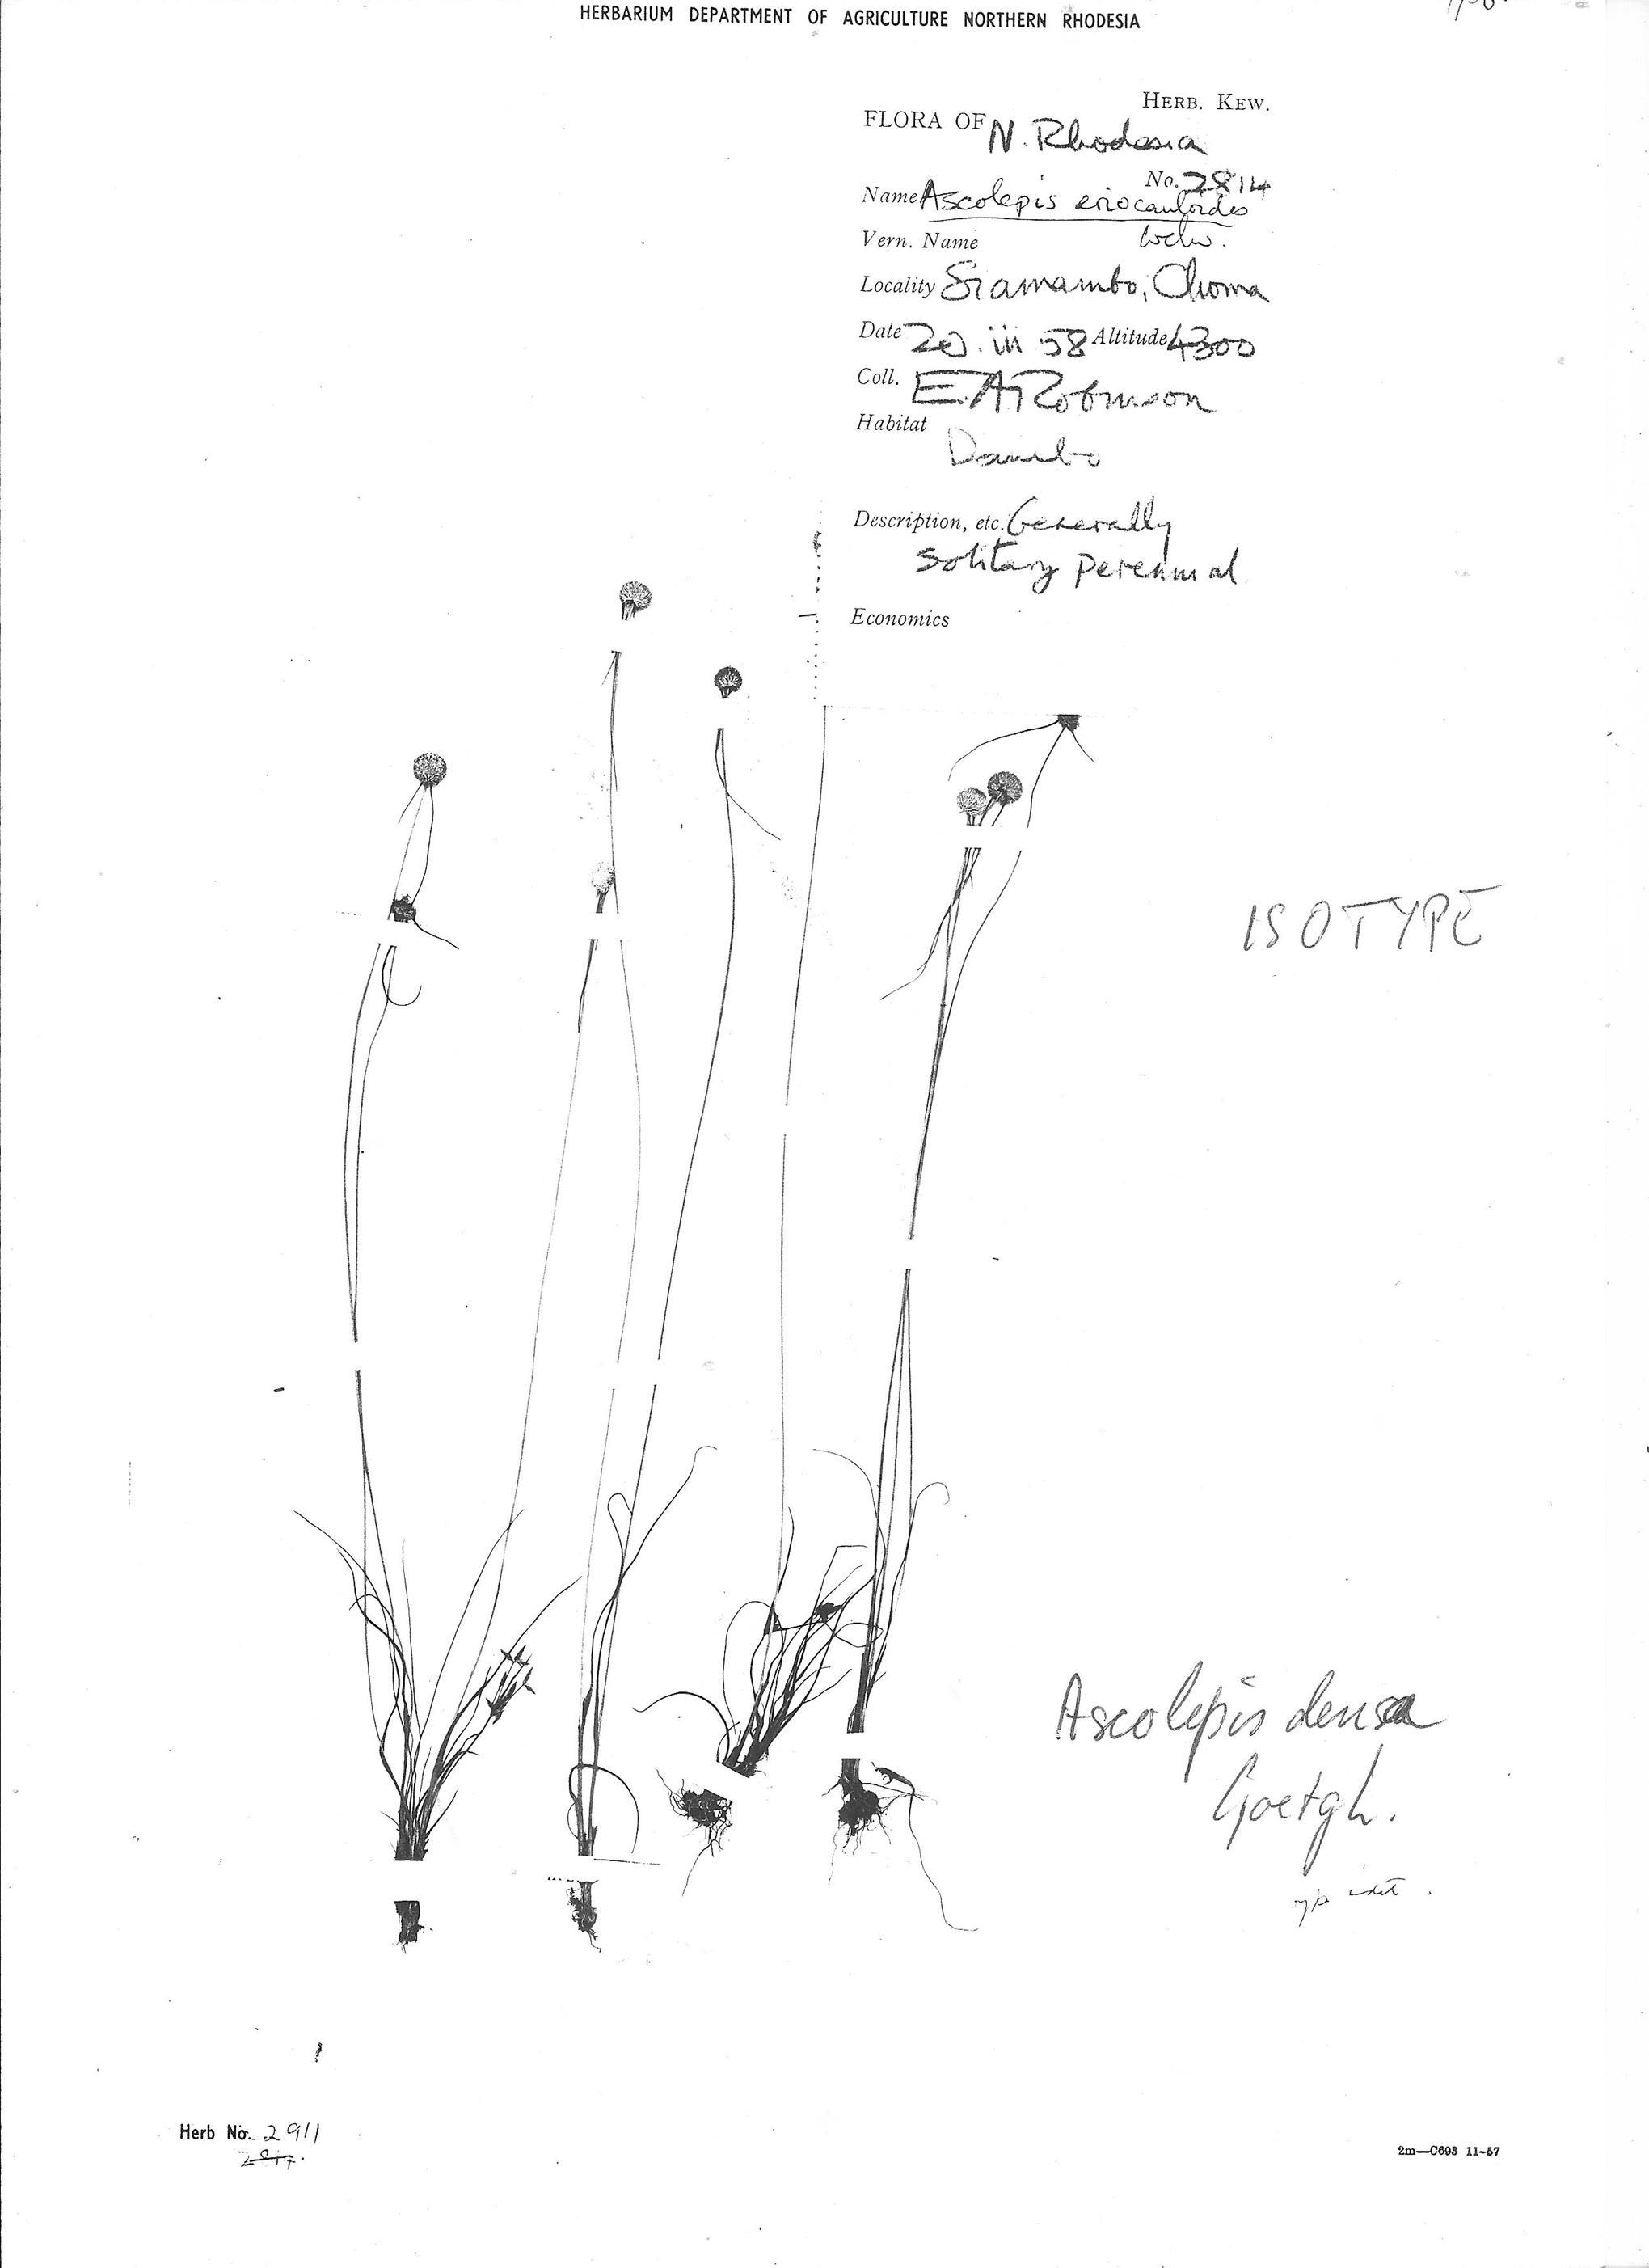 Ascolepis densa